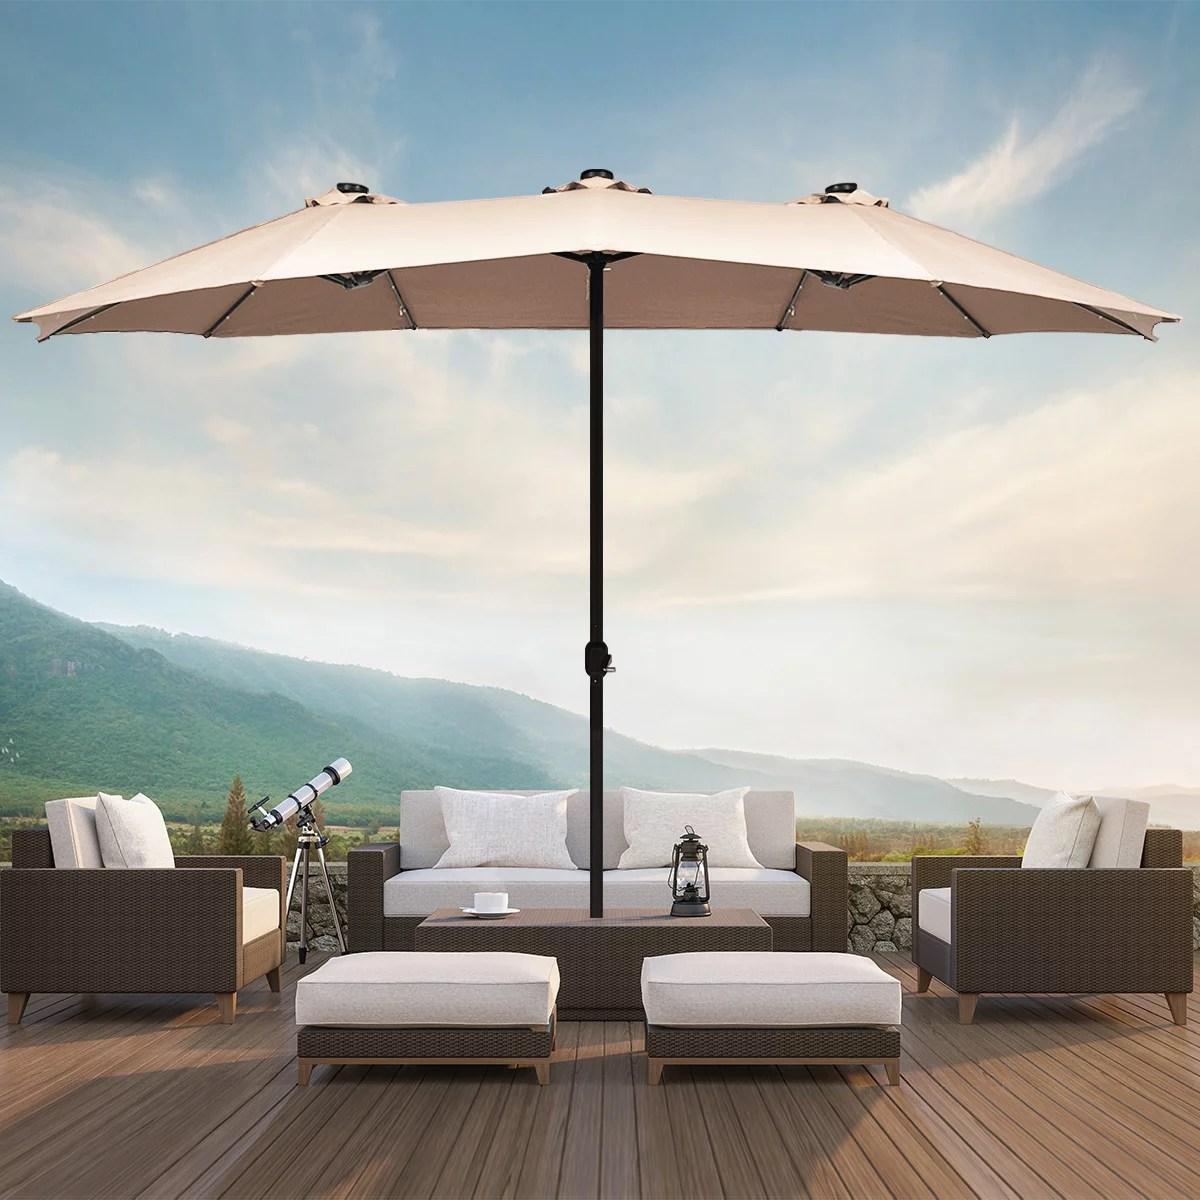 costway 15ft patio double sided solar led market umbrella crank beigetanorangeburgundy